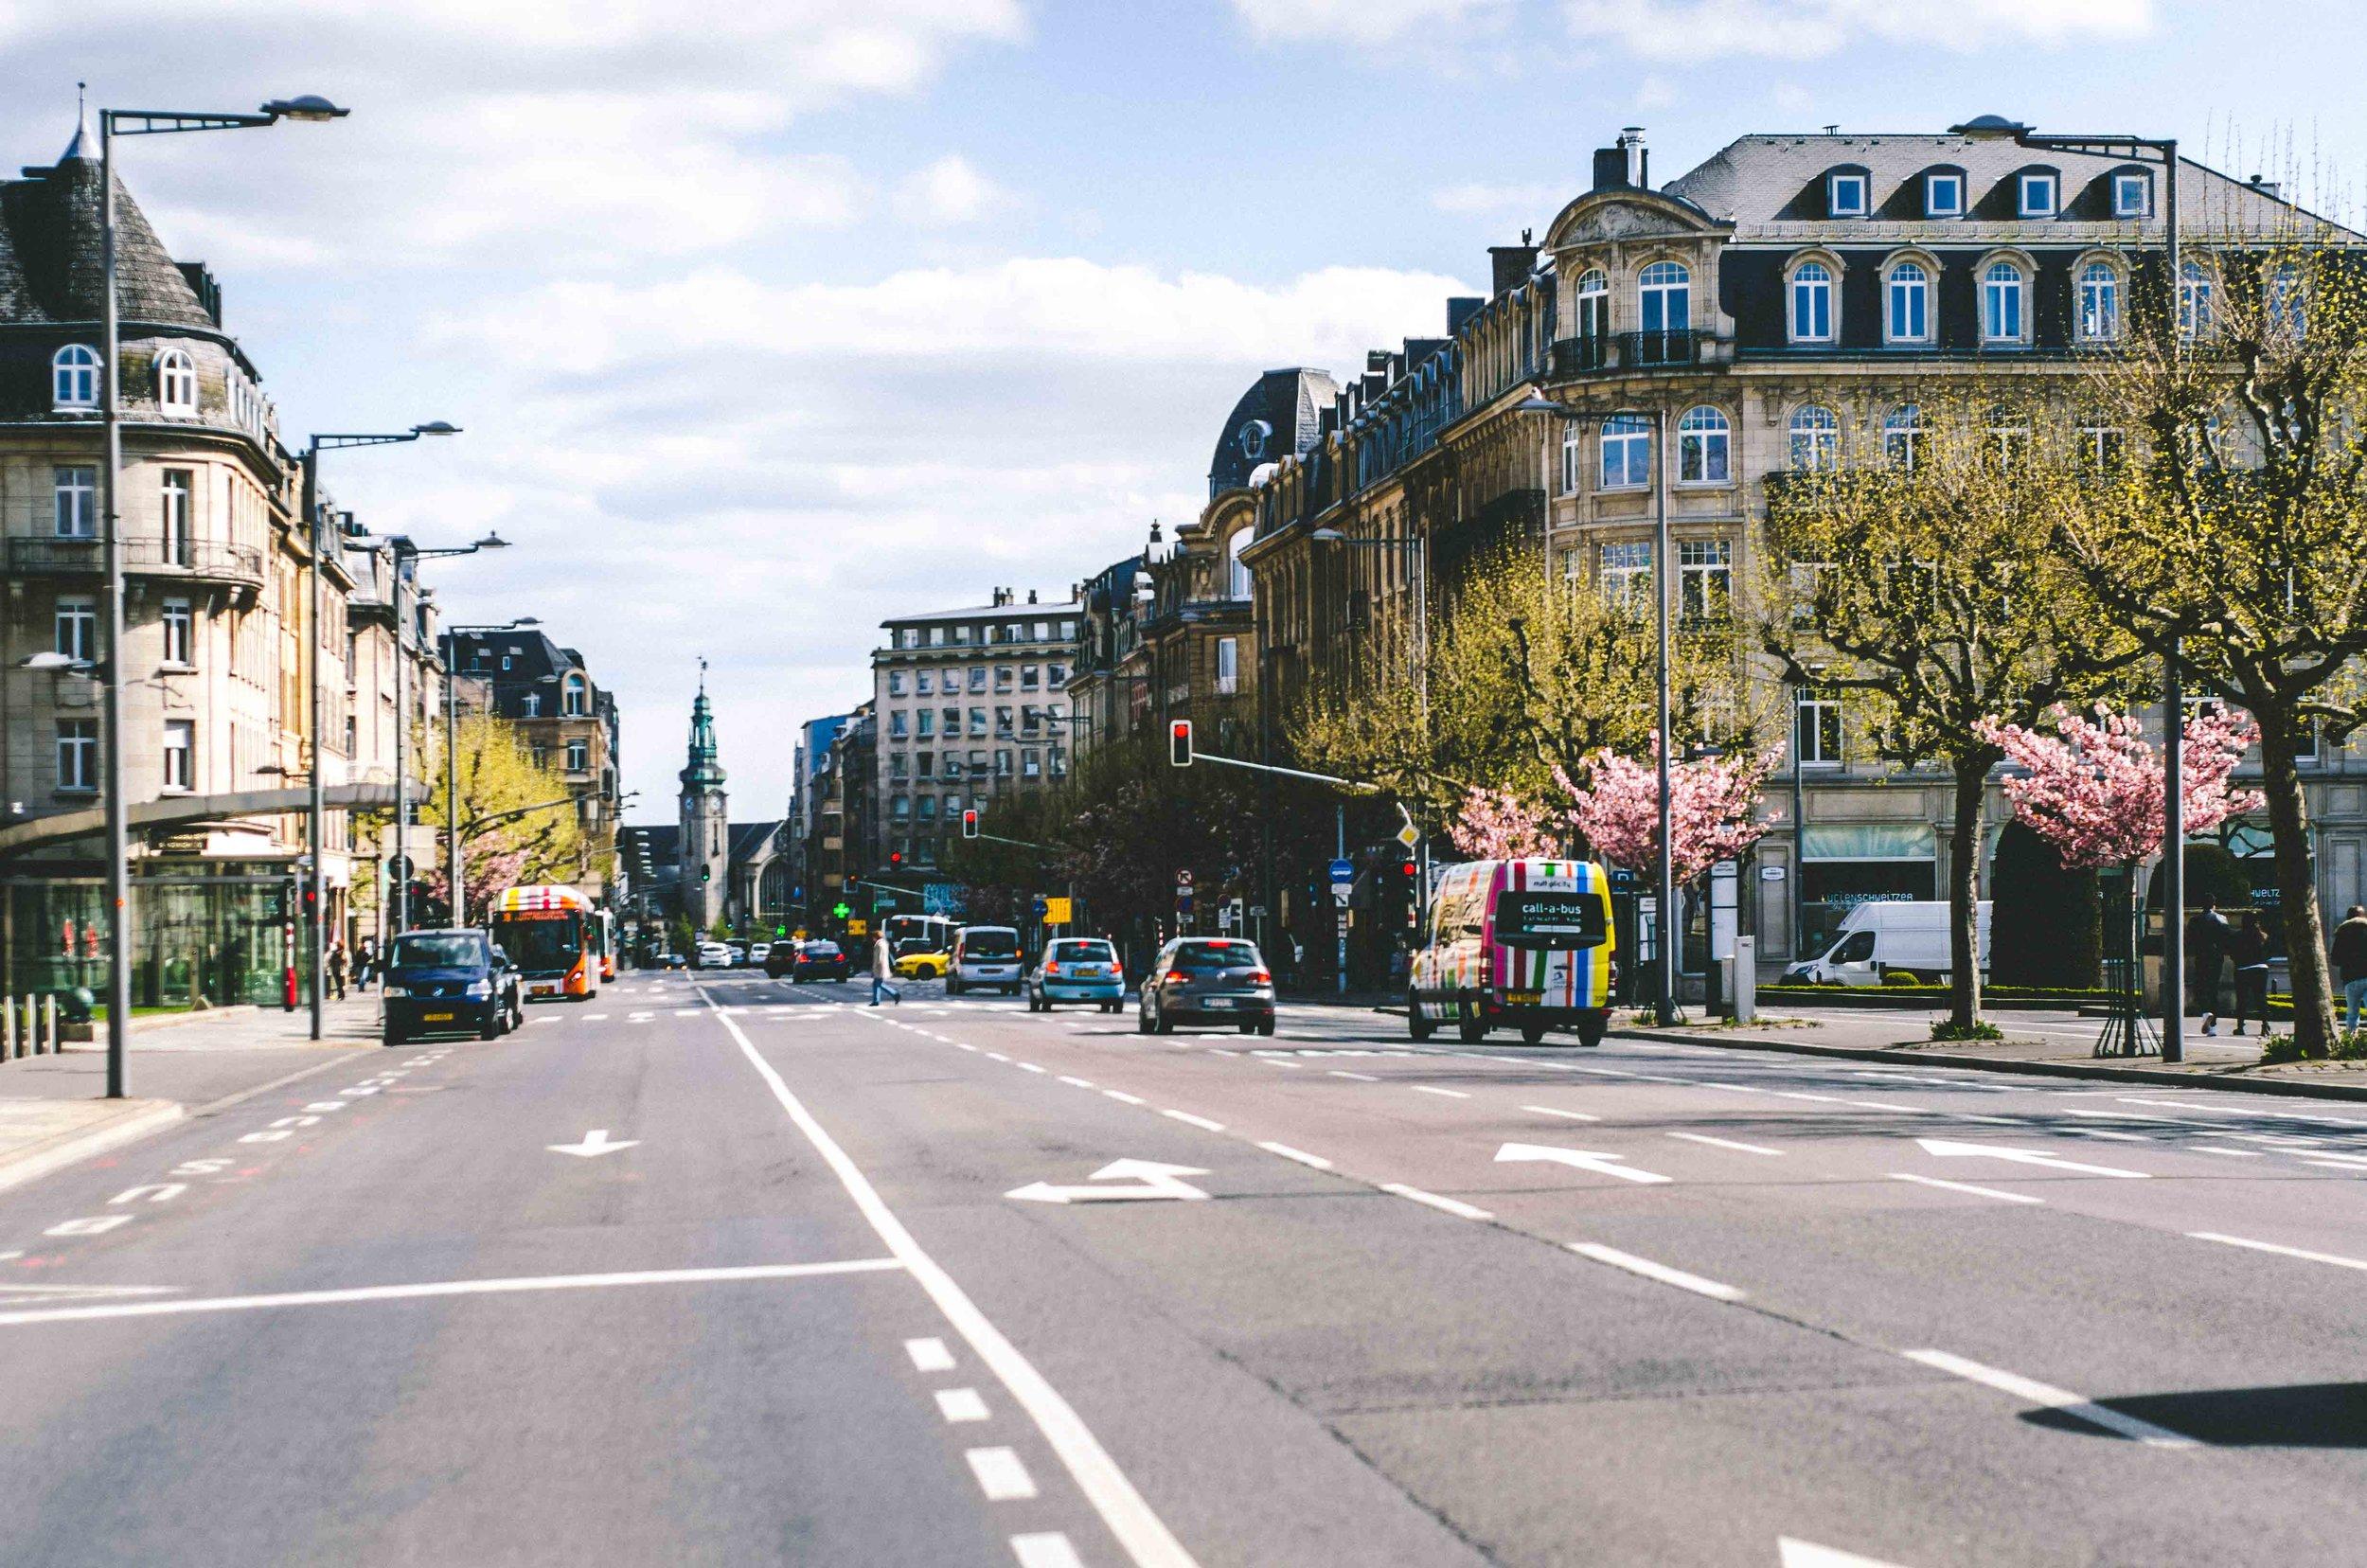 Avenue de la Liberté looking toward the main train station